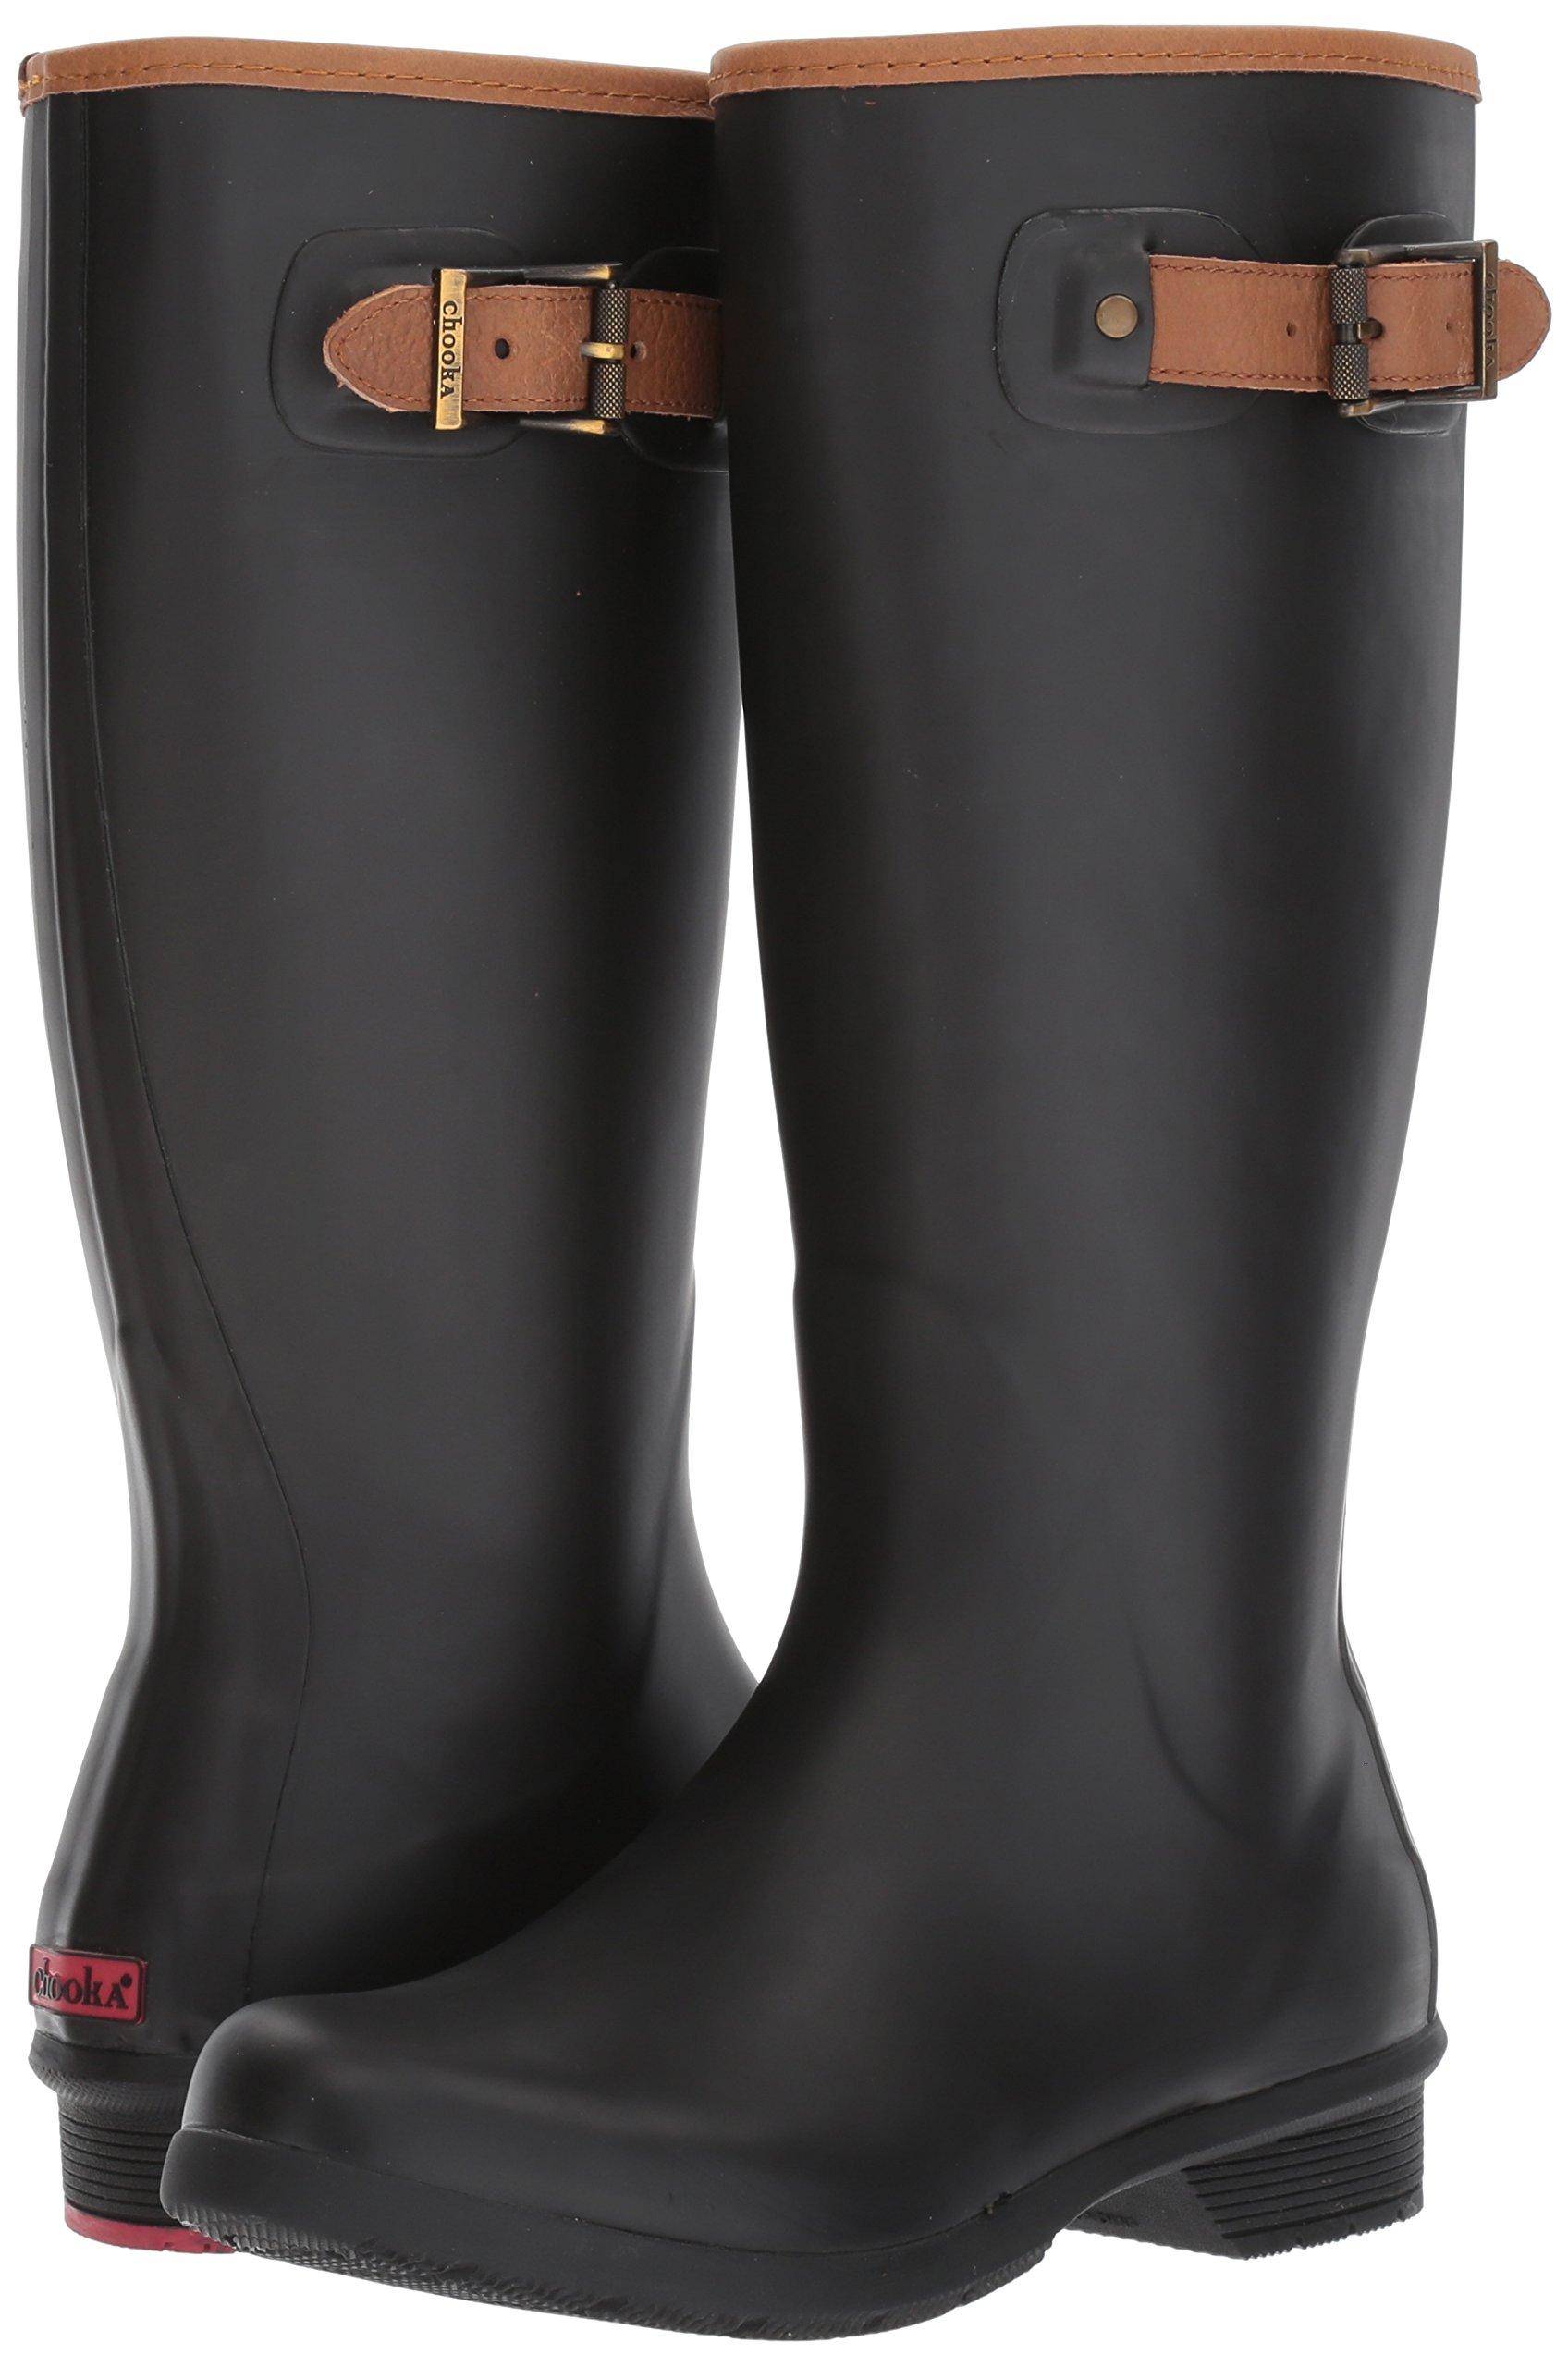 Chooka Women's Tall Memory Foam Rain Boot, Black, 7 M US by Chooka (Image #6)